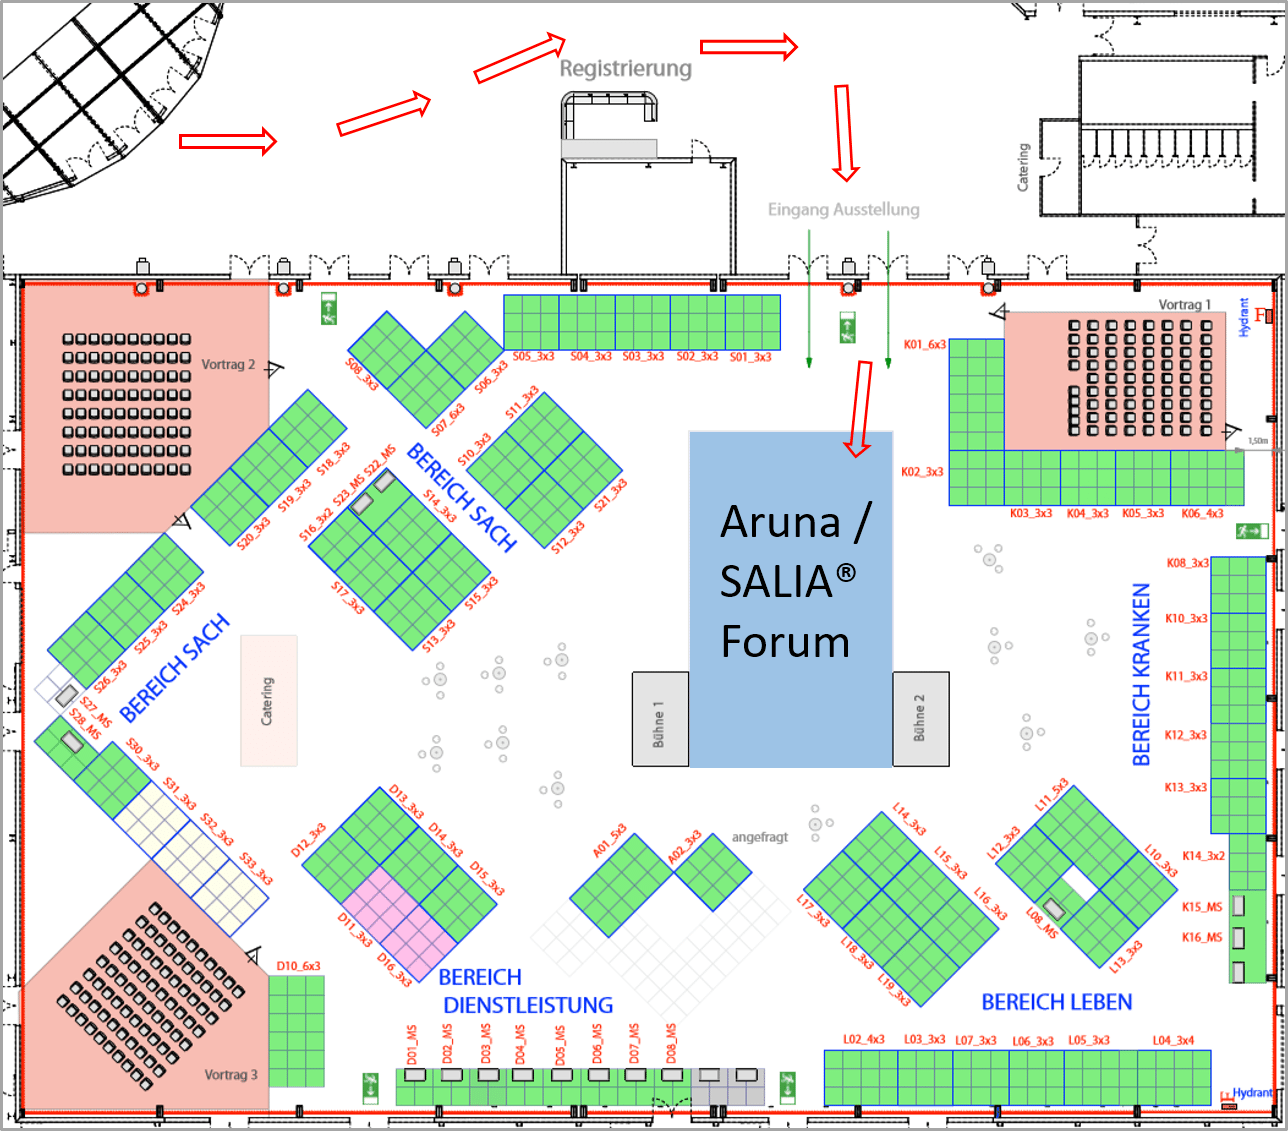 aruna-Messe-Standplan